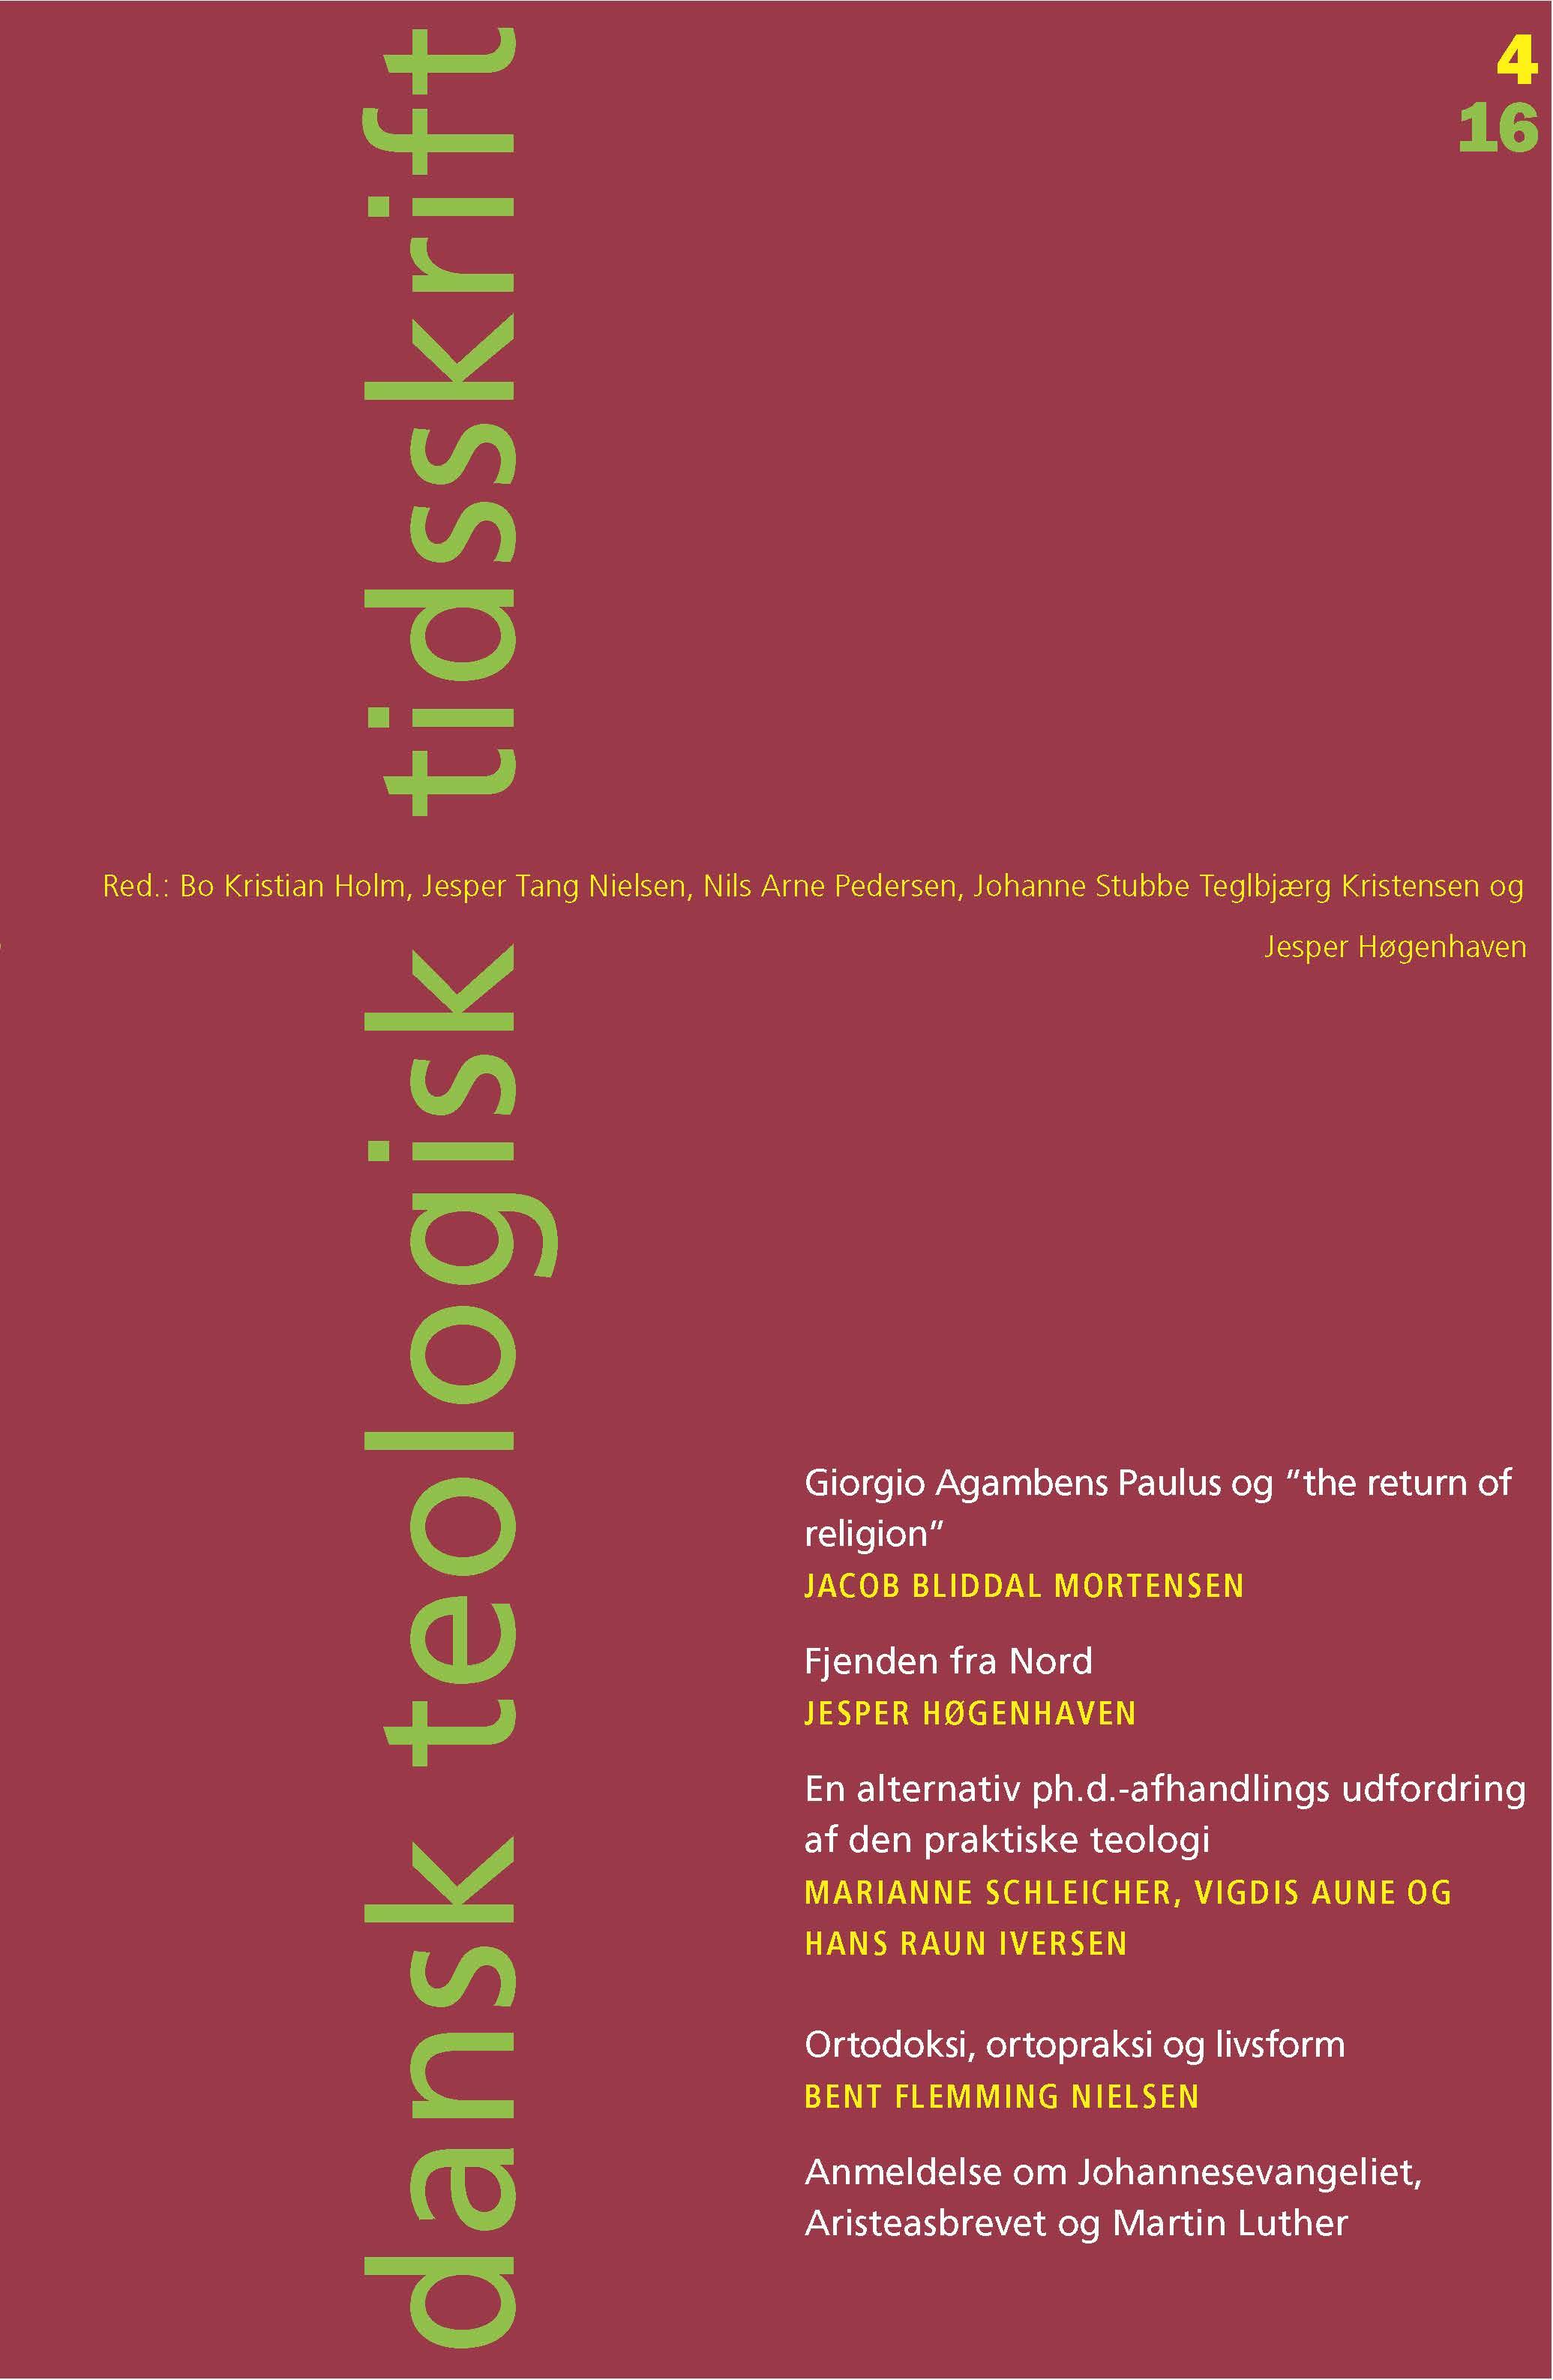 Dansk Teologisk Tidsskrift nr. 4, 2016